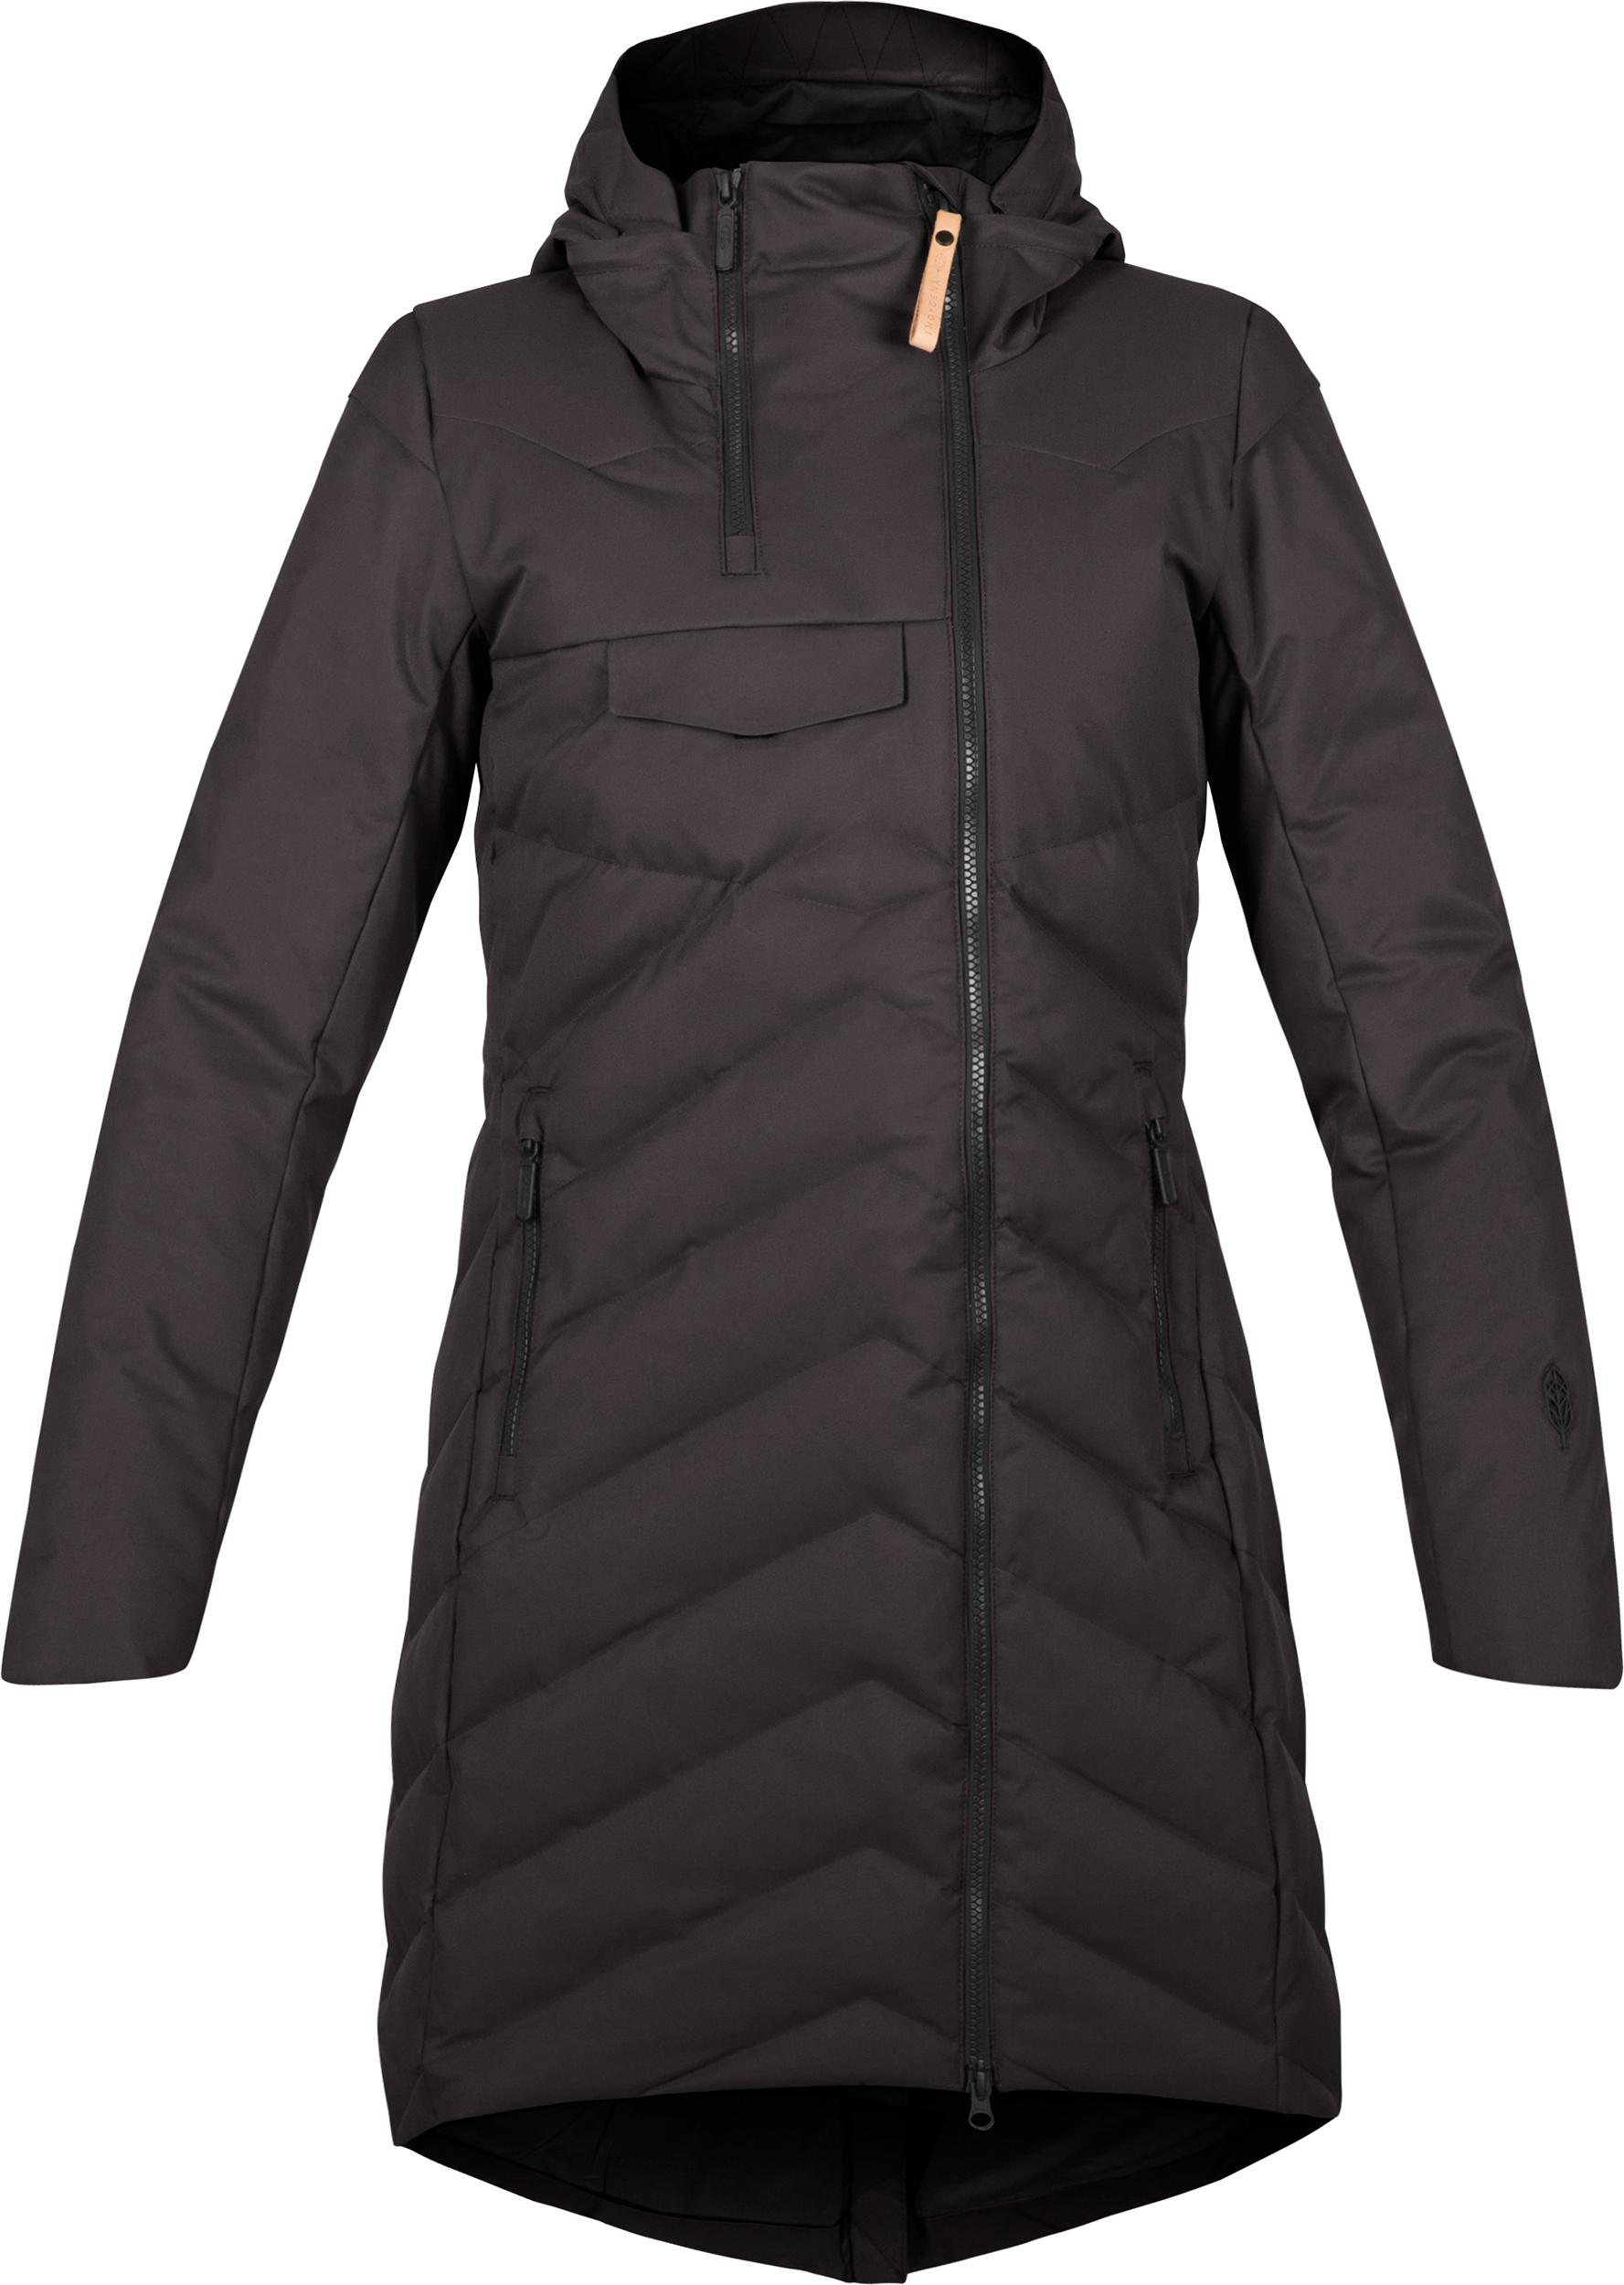 Women s Insulated jackets 19b94585a